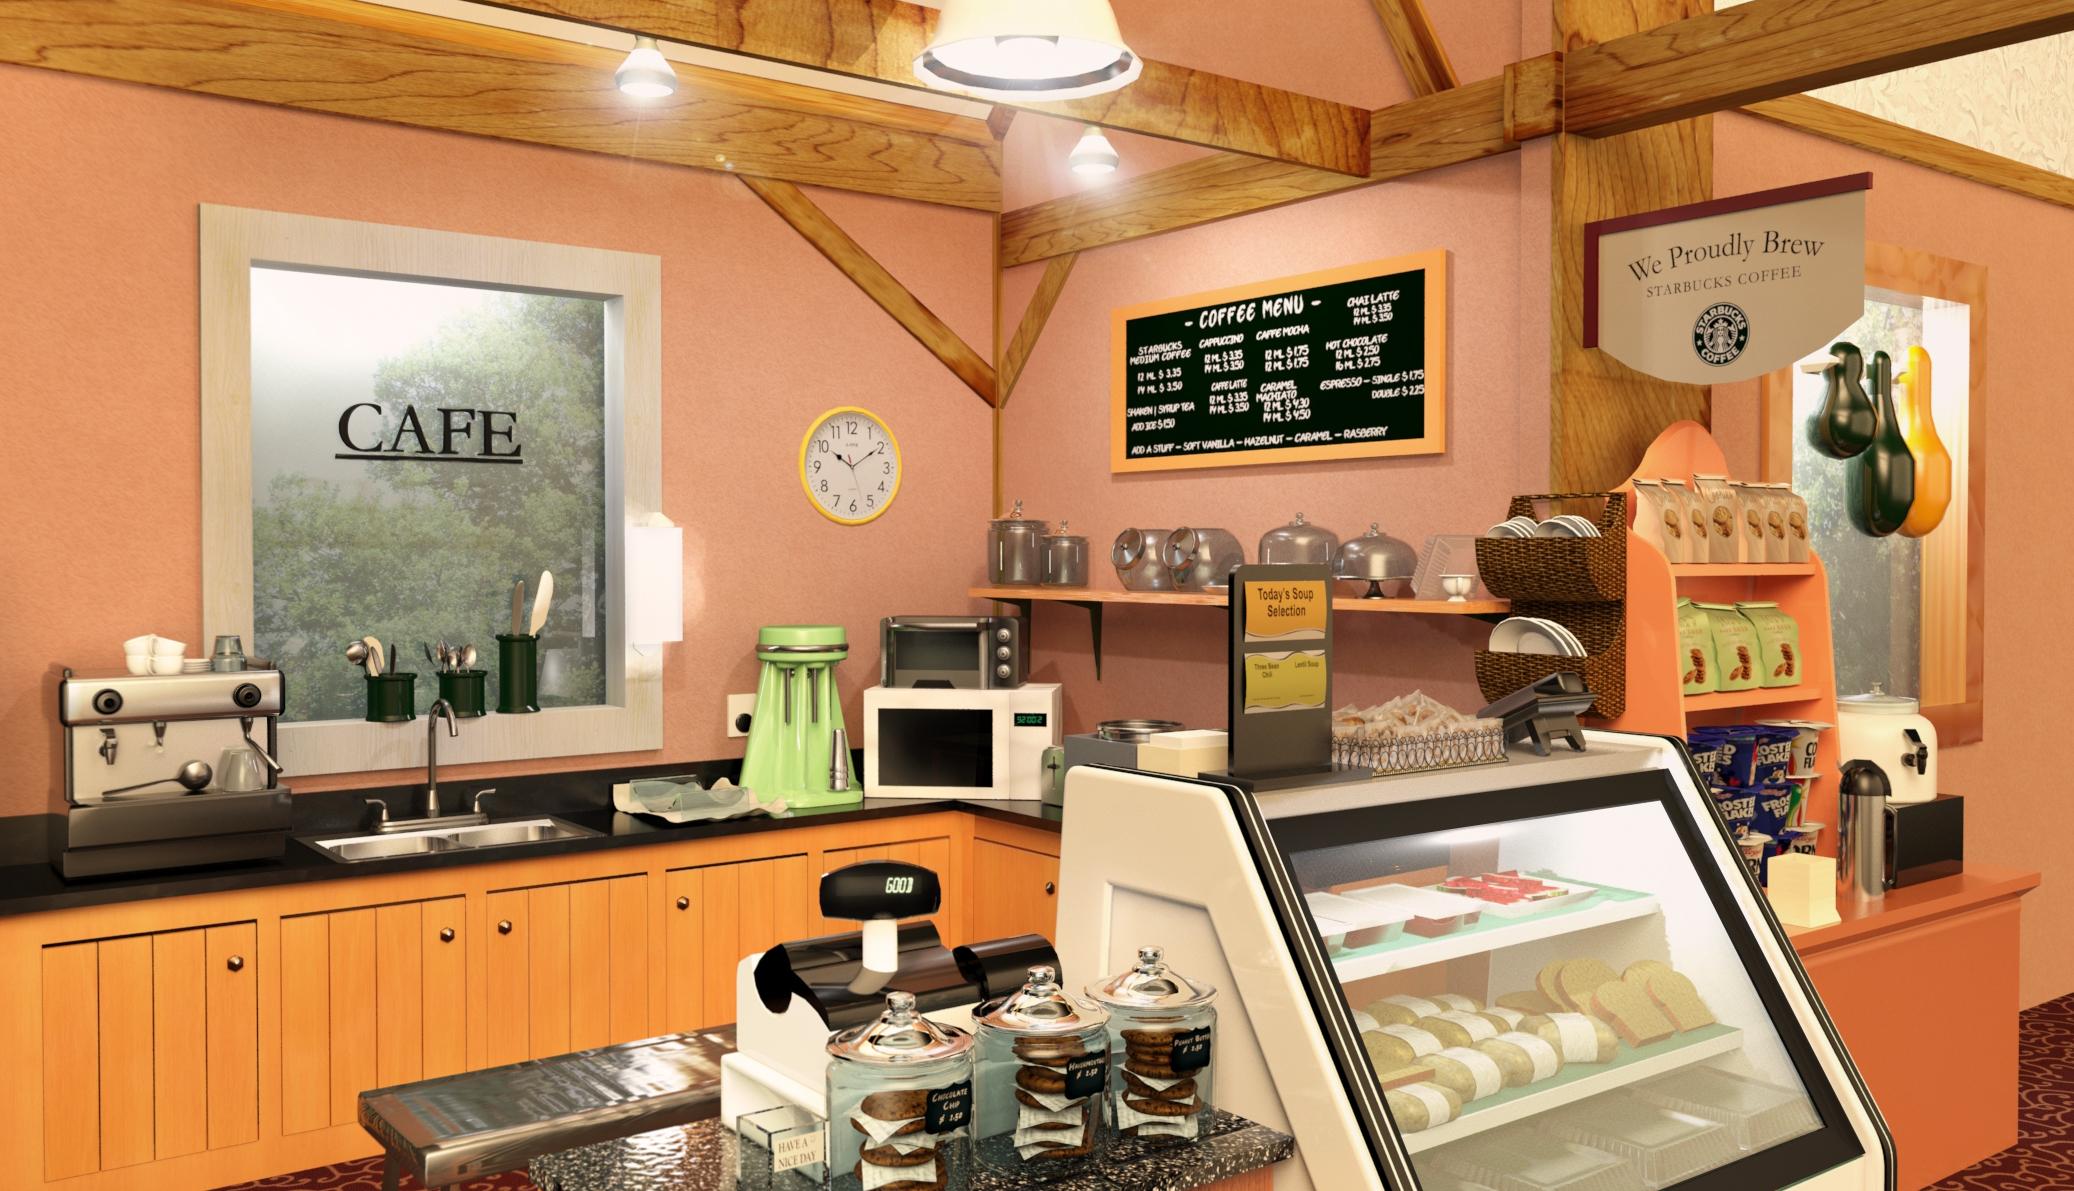 3D Starbucks Coffee Shop Interior on Behance